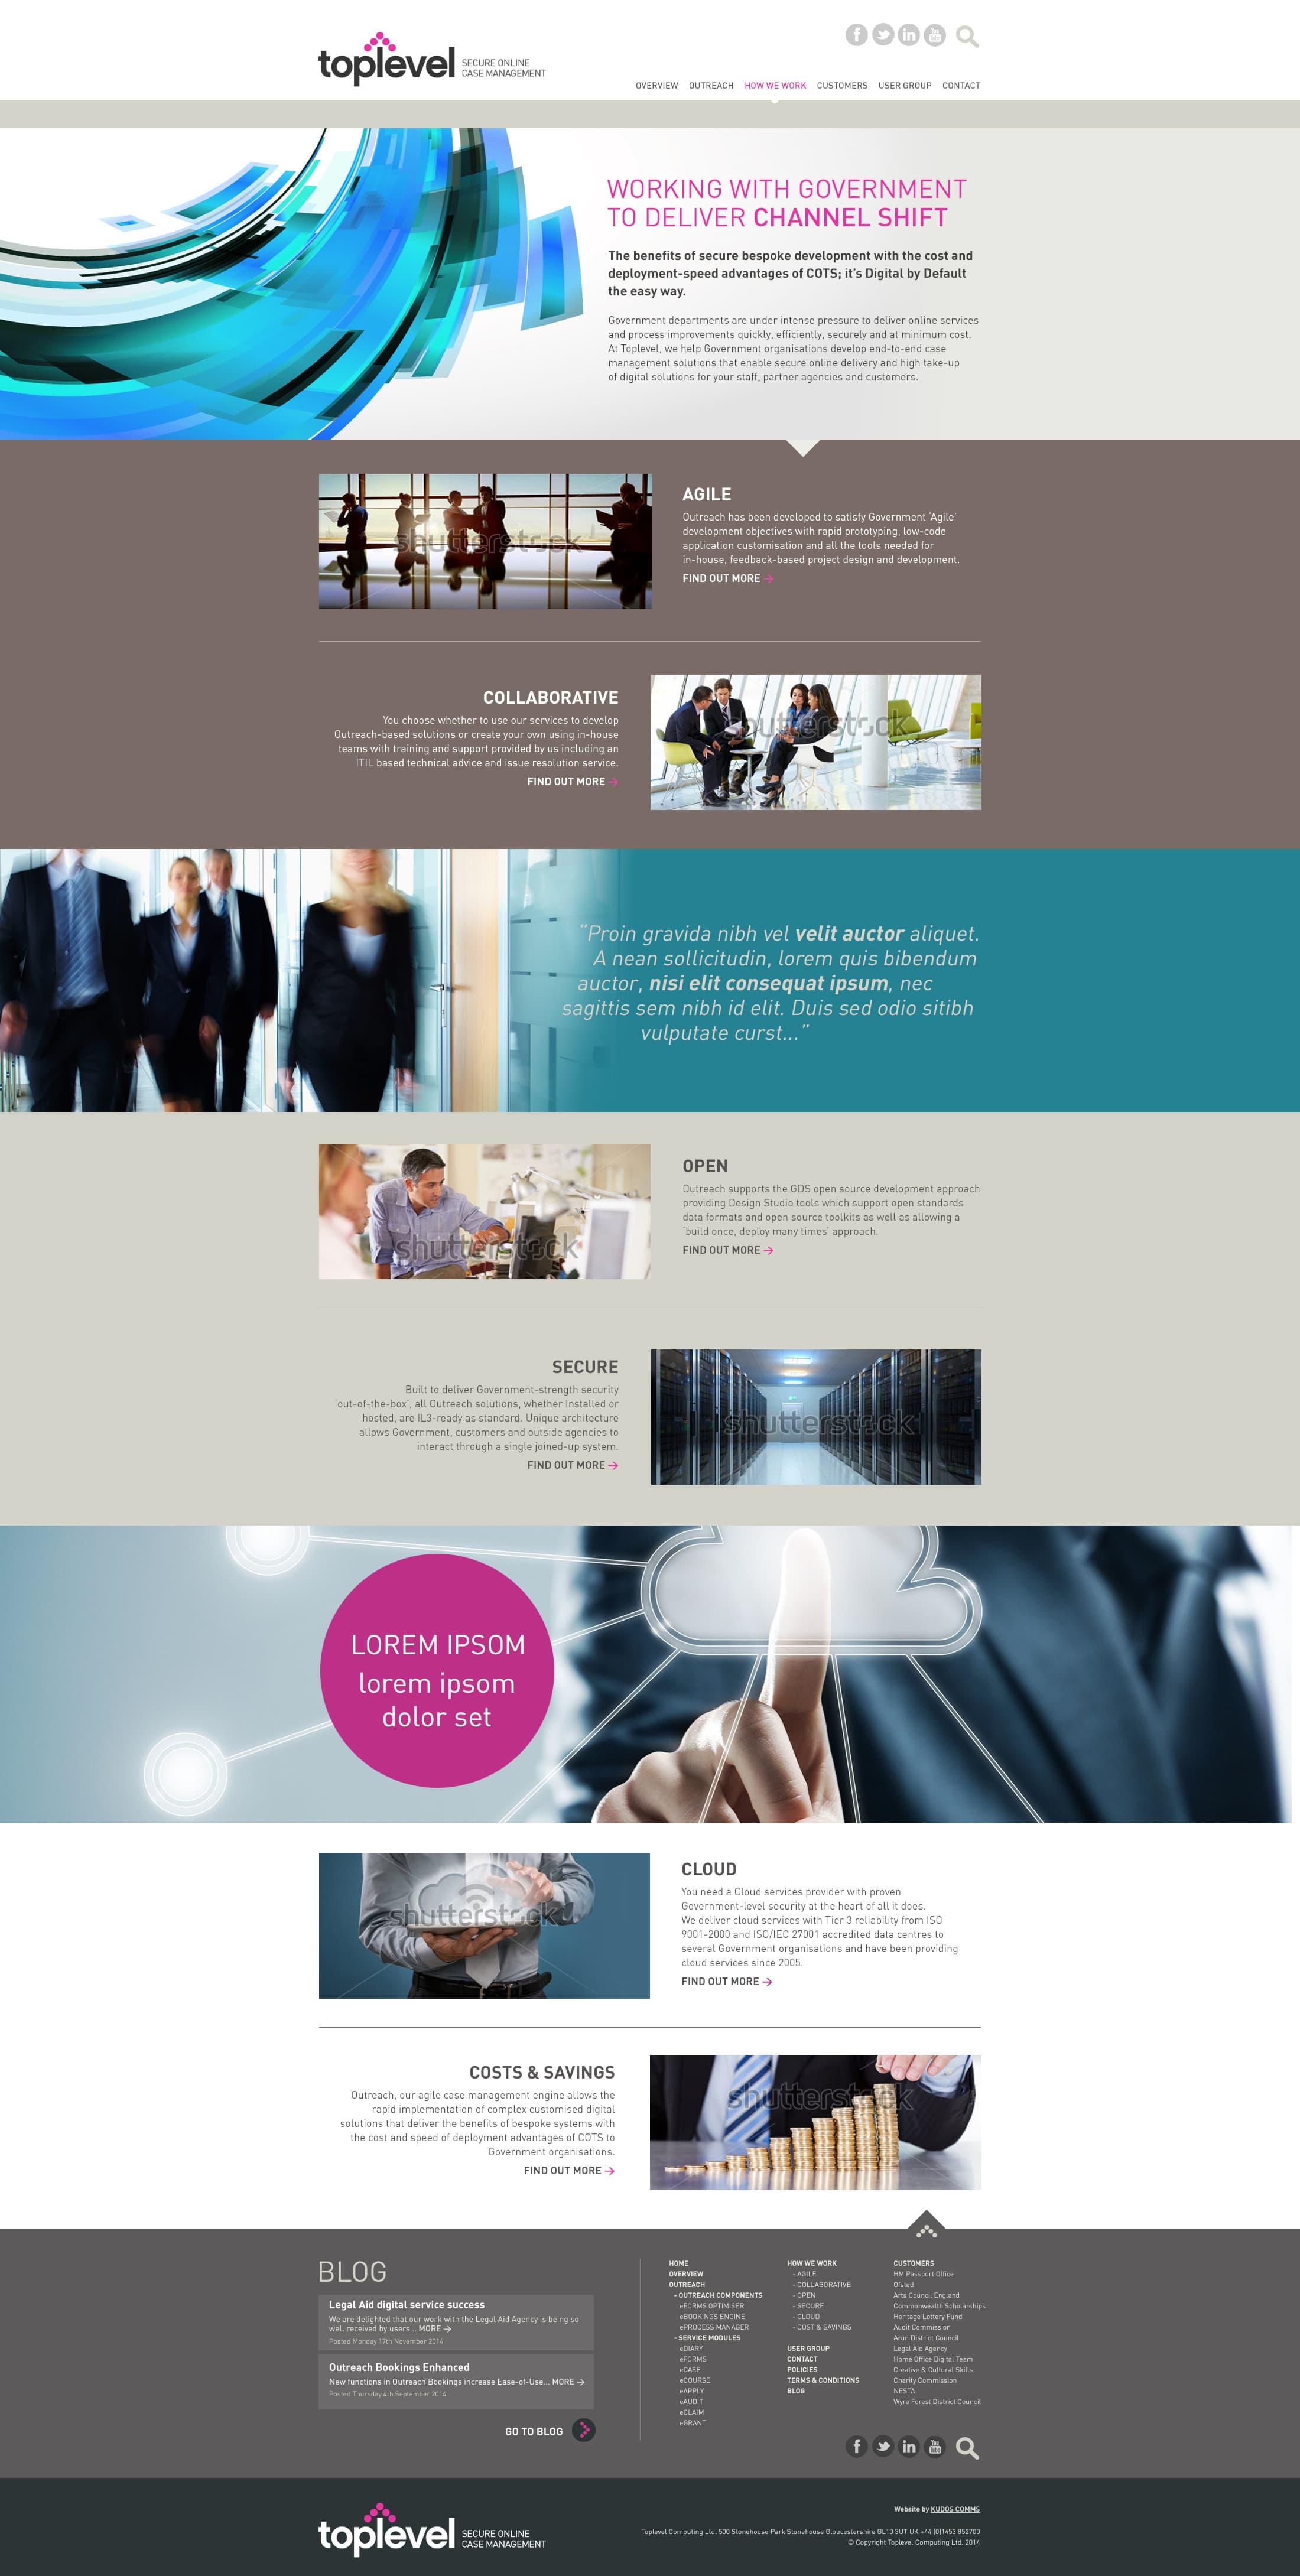 Kudos Portfolio | See Examples of Our Design & Marketing